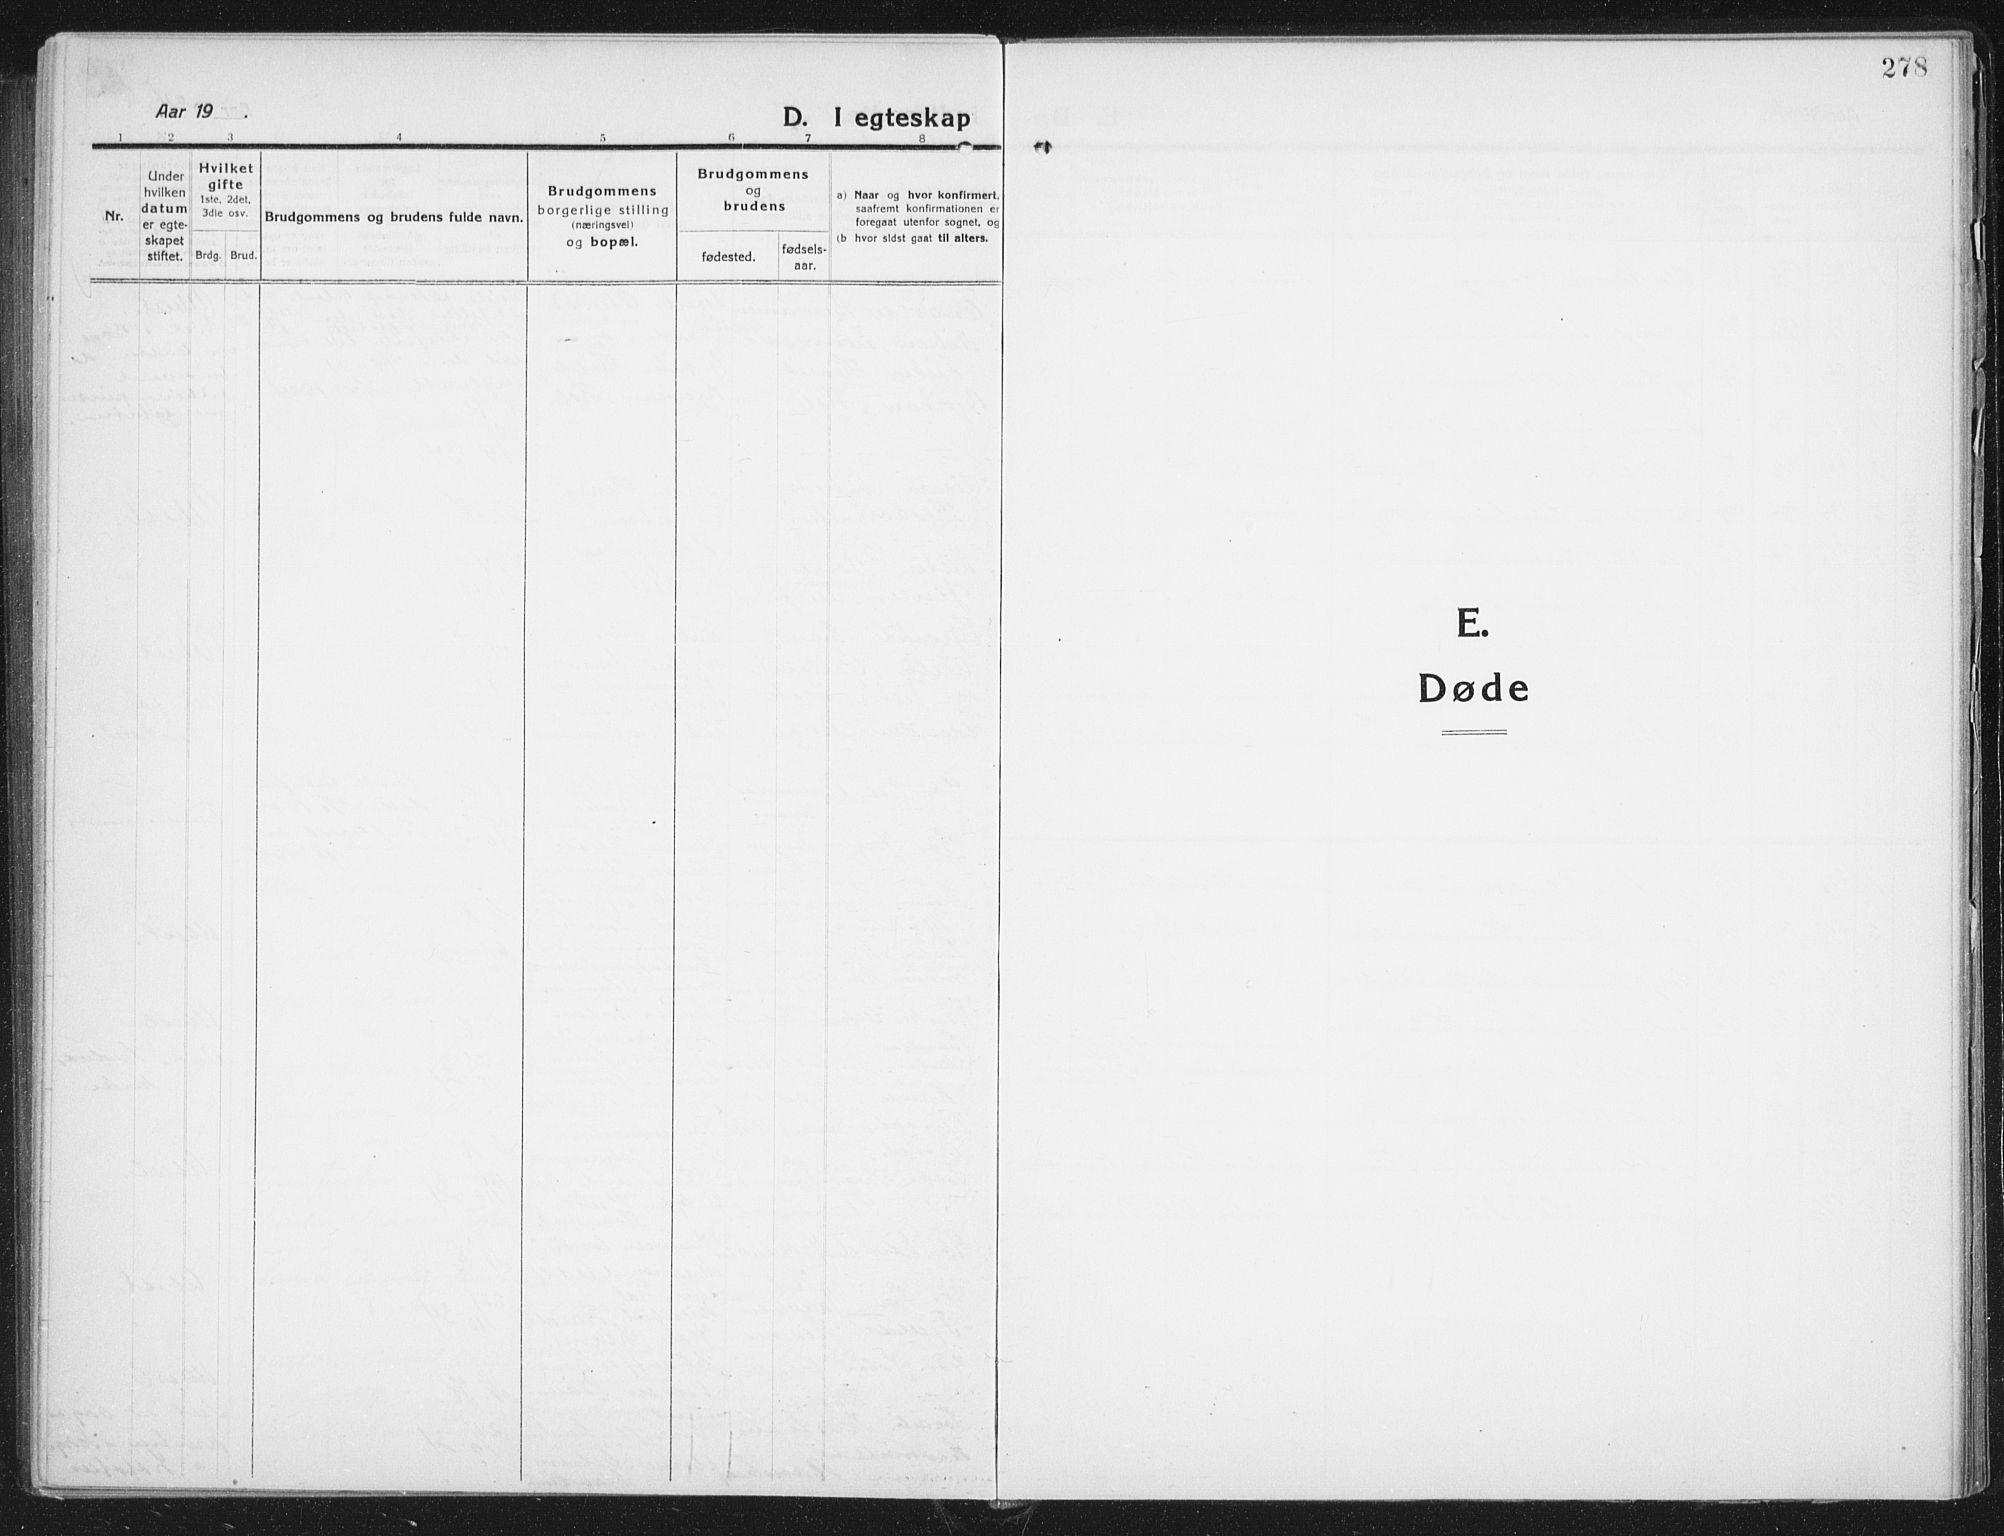 SAT, Ministerialprotokoller, klokkerbøker og fødselsregistre - Nordland, 882/L1183: Klokkerbok nr. 882C01, 1911-1938, s. 278